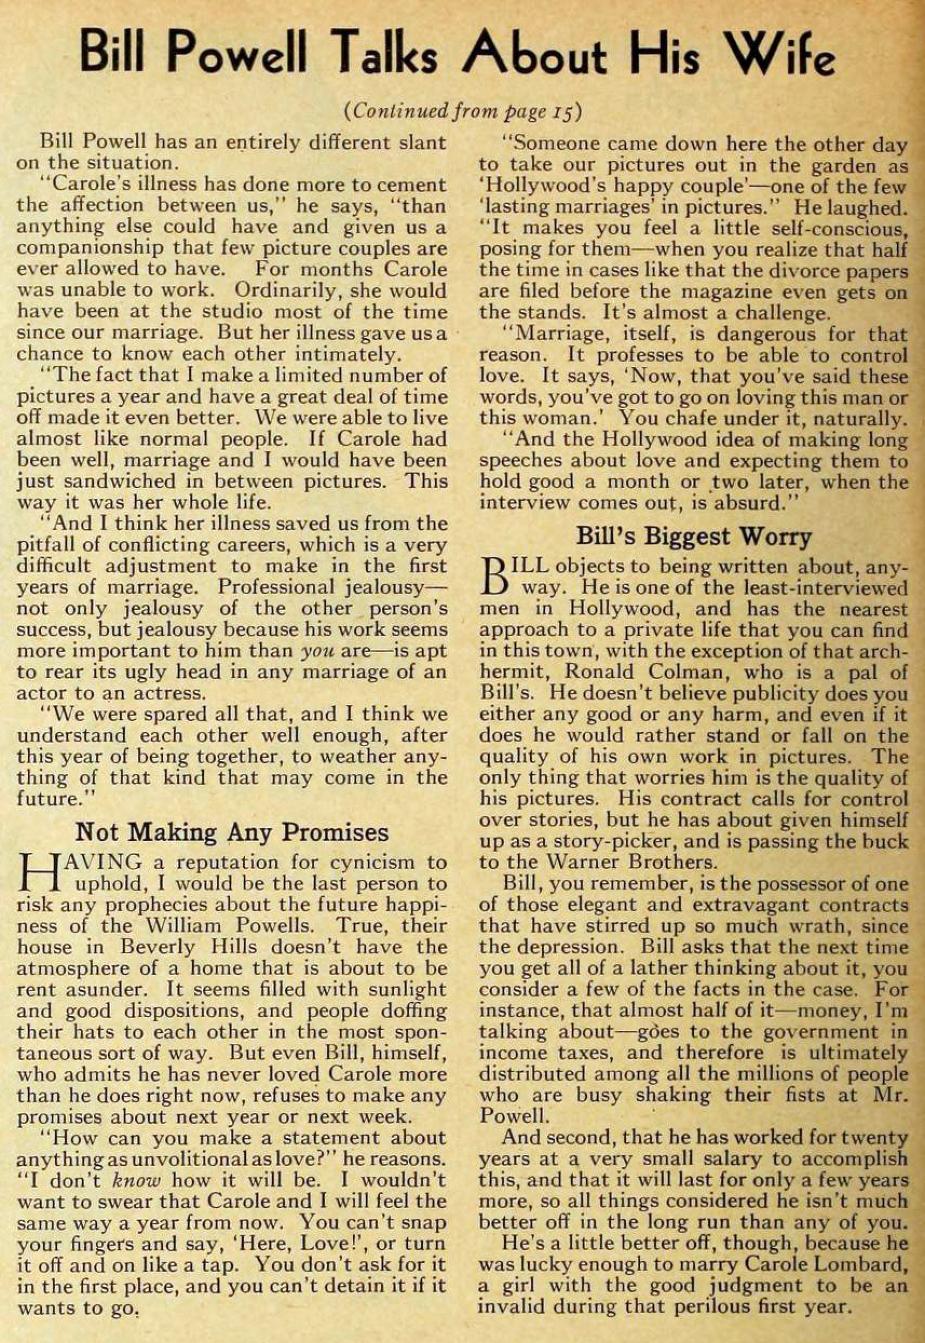 carole lombard movie classic november 1932 william powell 01a